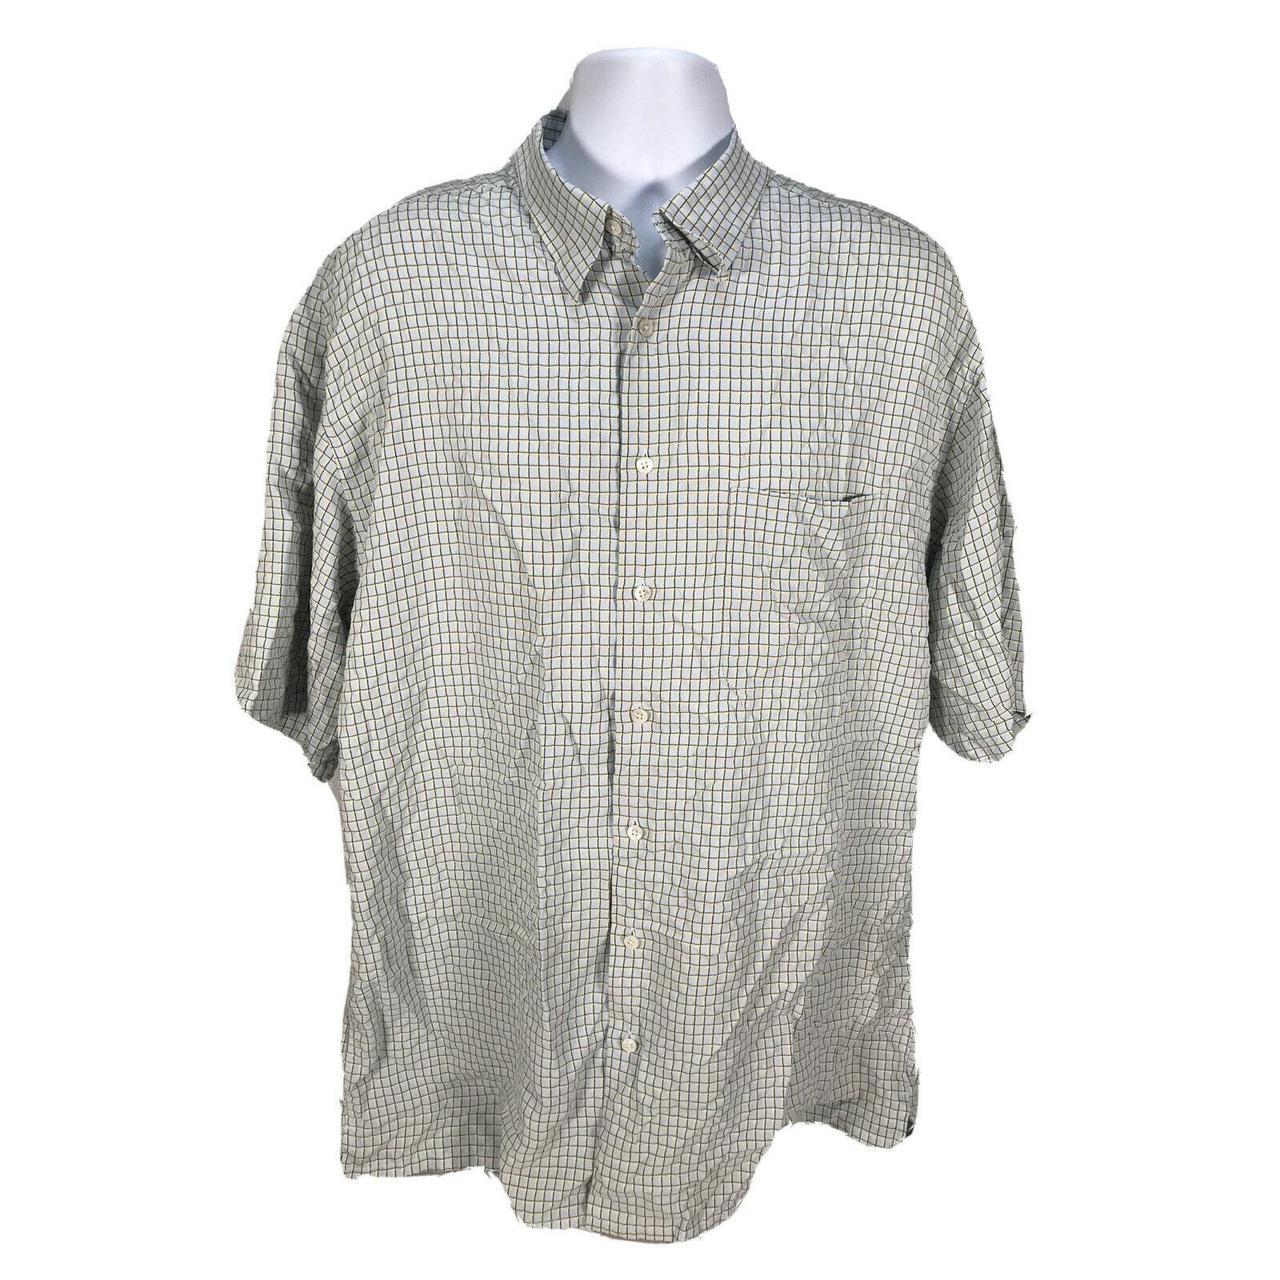 Product Image 1 - Bugatchi Men's Blue/Yellow Check Short